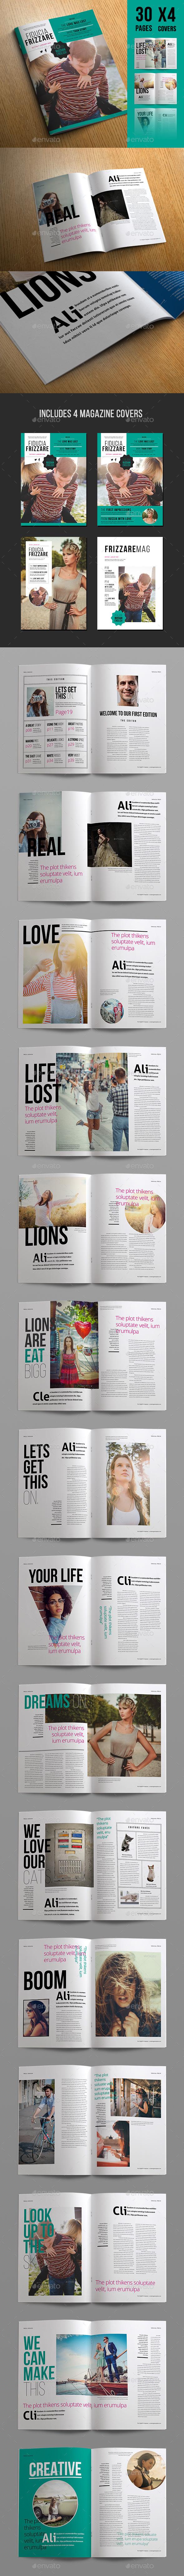 Frizzare Magazine - Magazines Print Templates